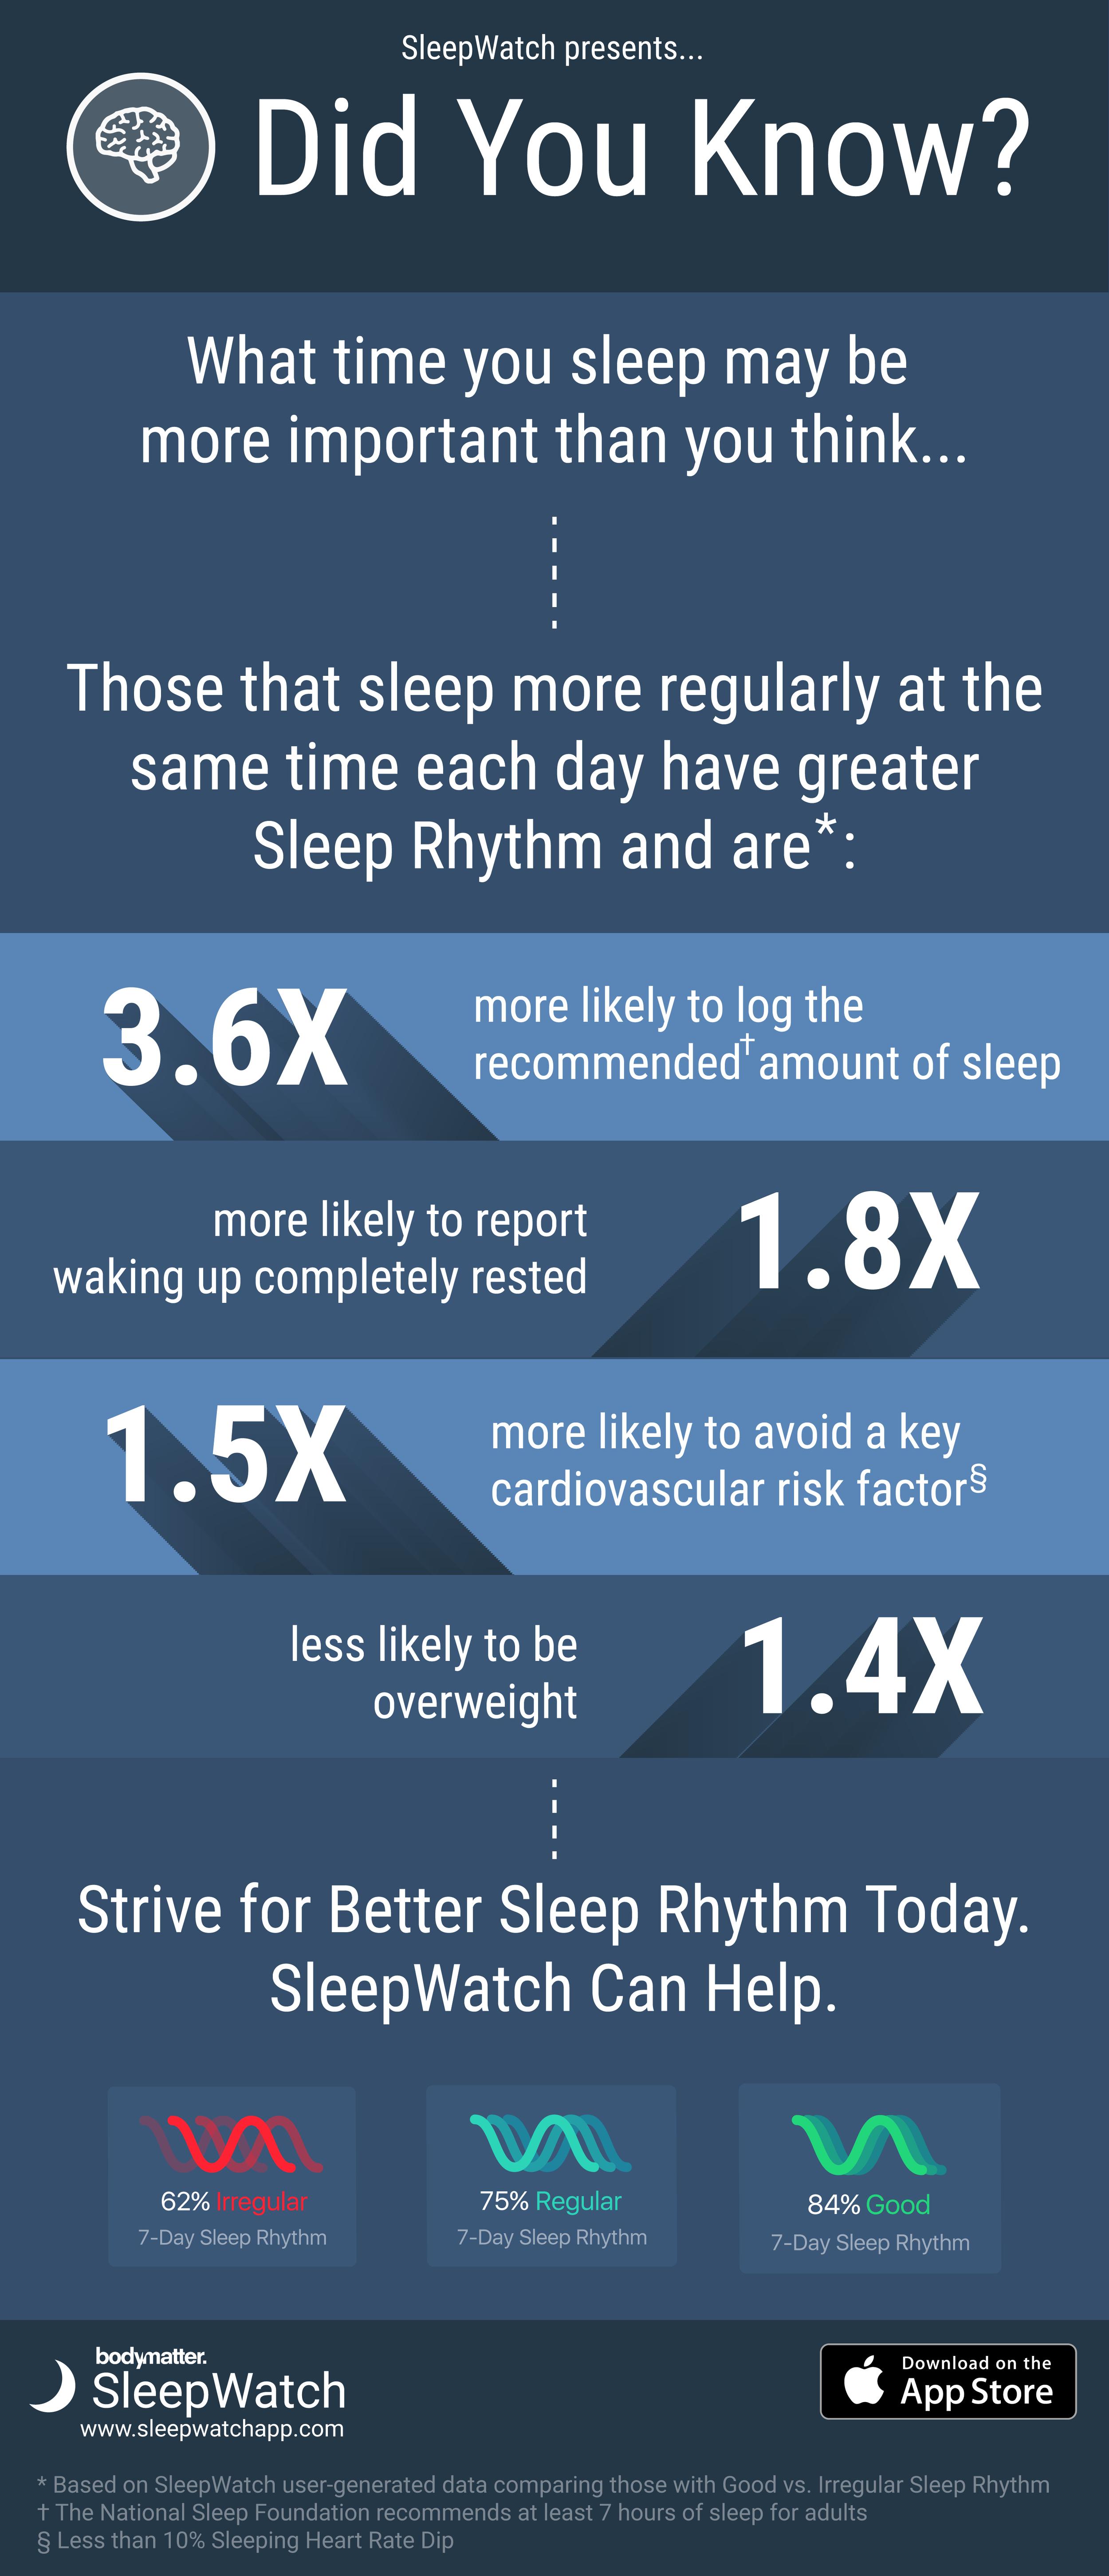 Sleep Rhythm Infographic - SleepWatch by Bodymatter